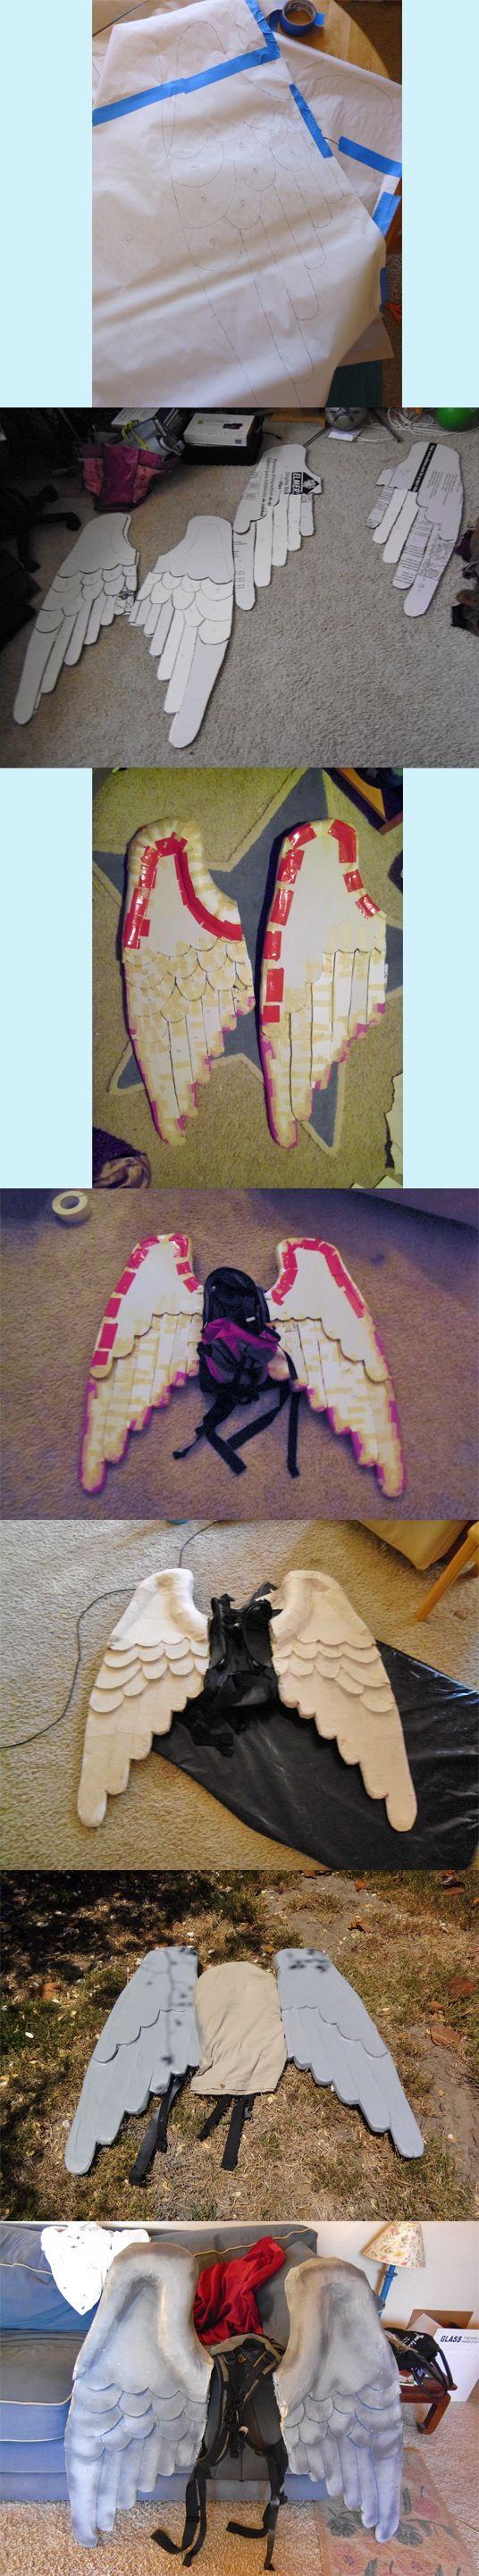 Weeping Angel Wings Process by ~DorkySpork on deviantART